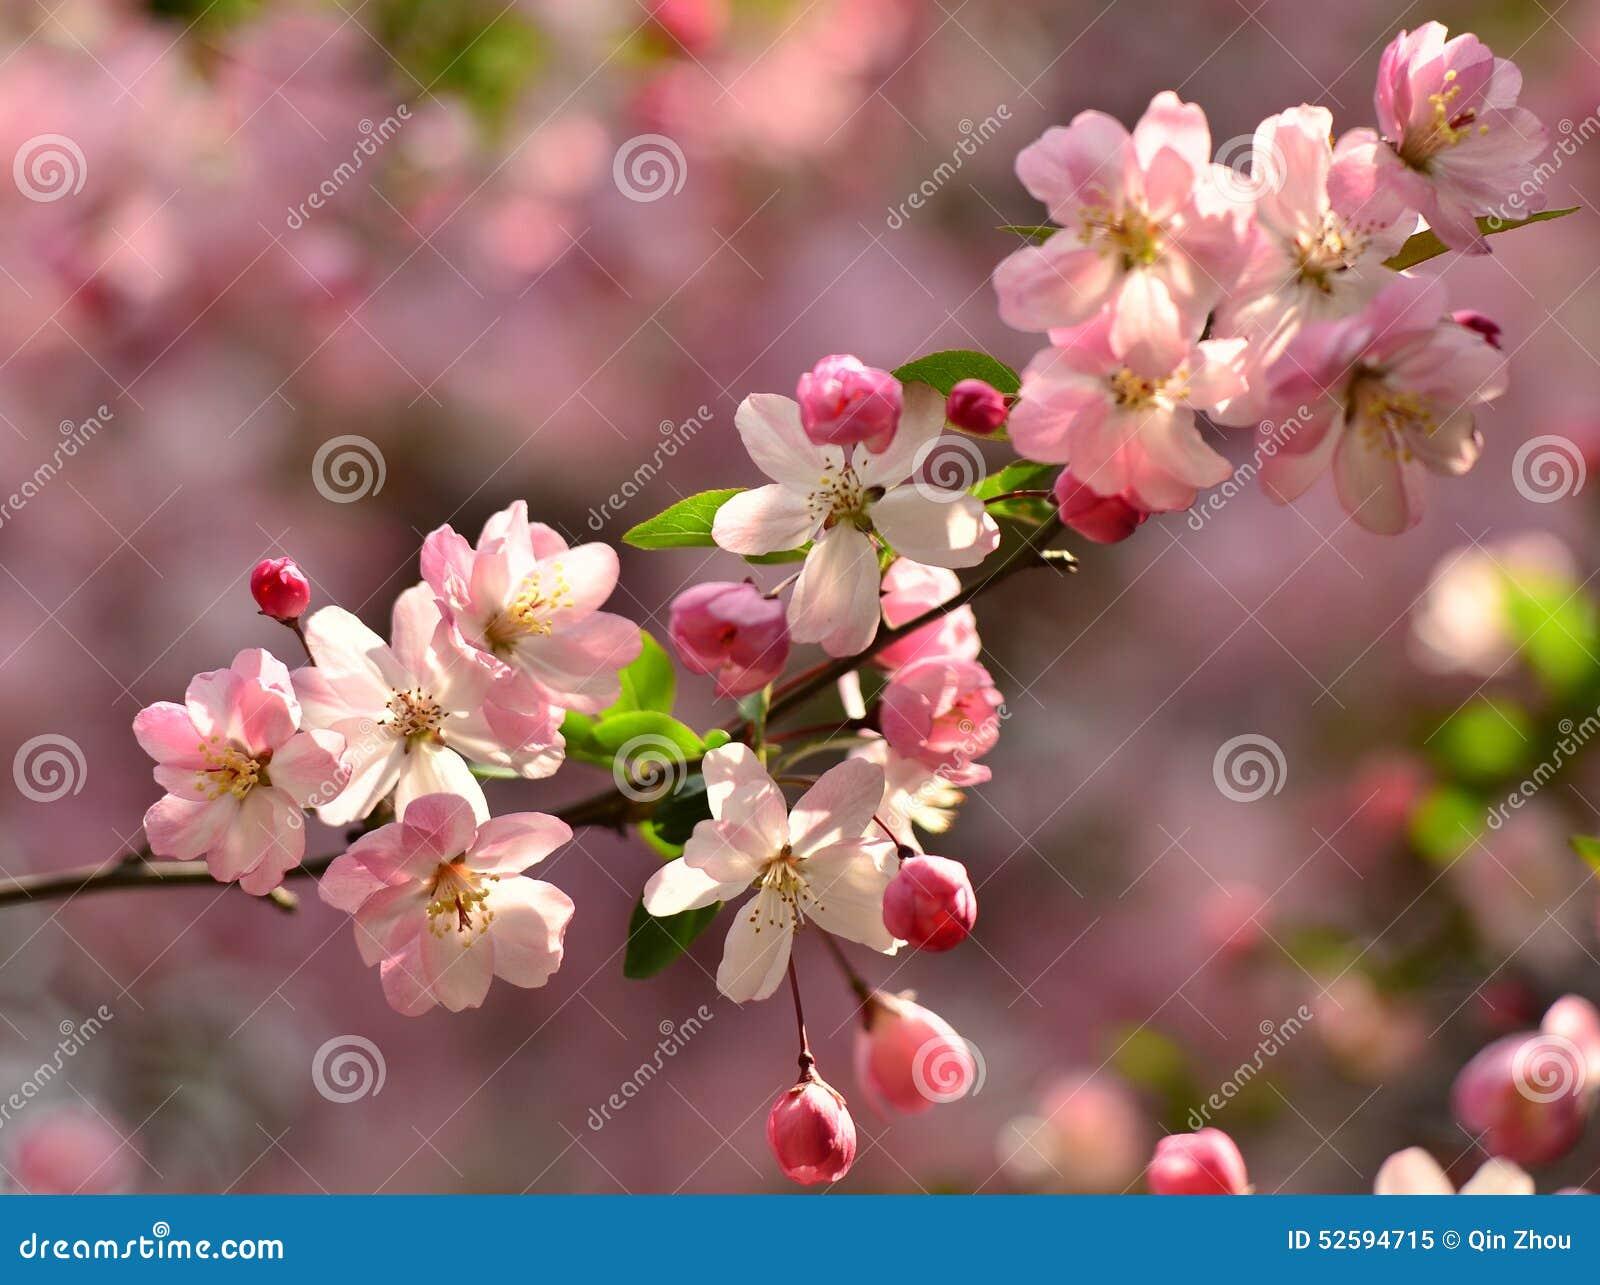 im m rz bl ht rosa begonie in voller bl te im park in. Black Bedroom Furniture Sets. Home Design Ideas